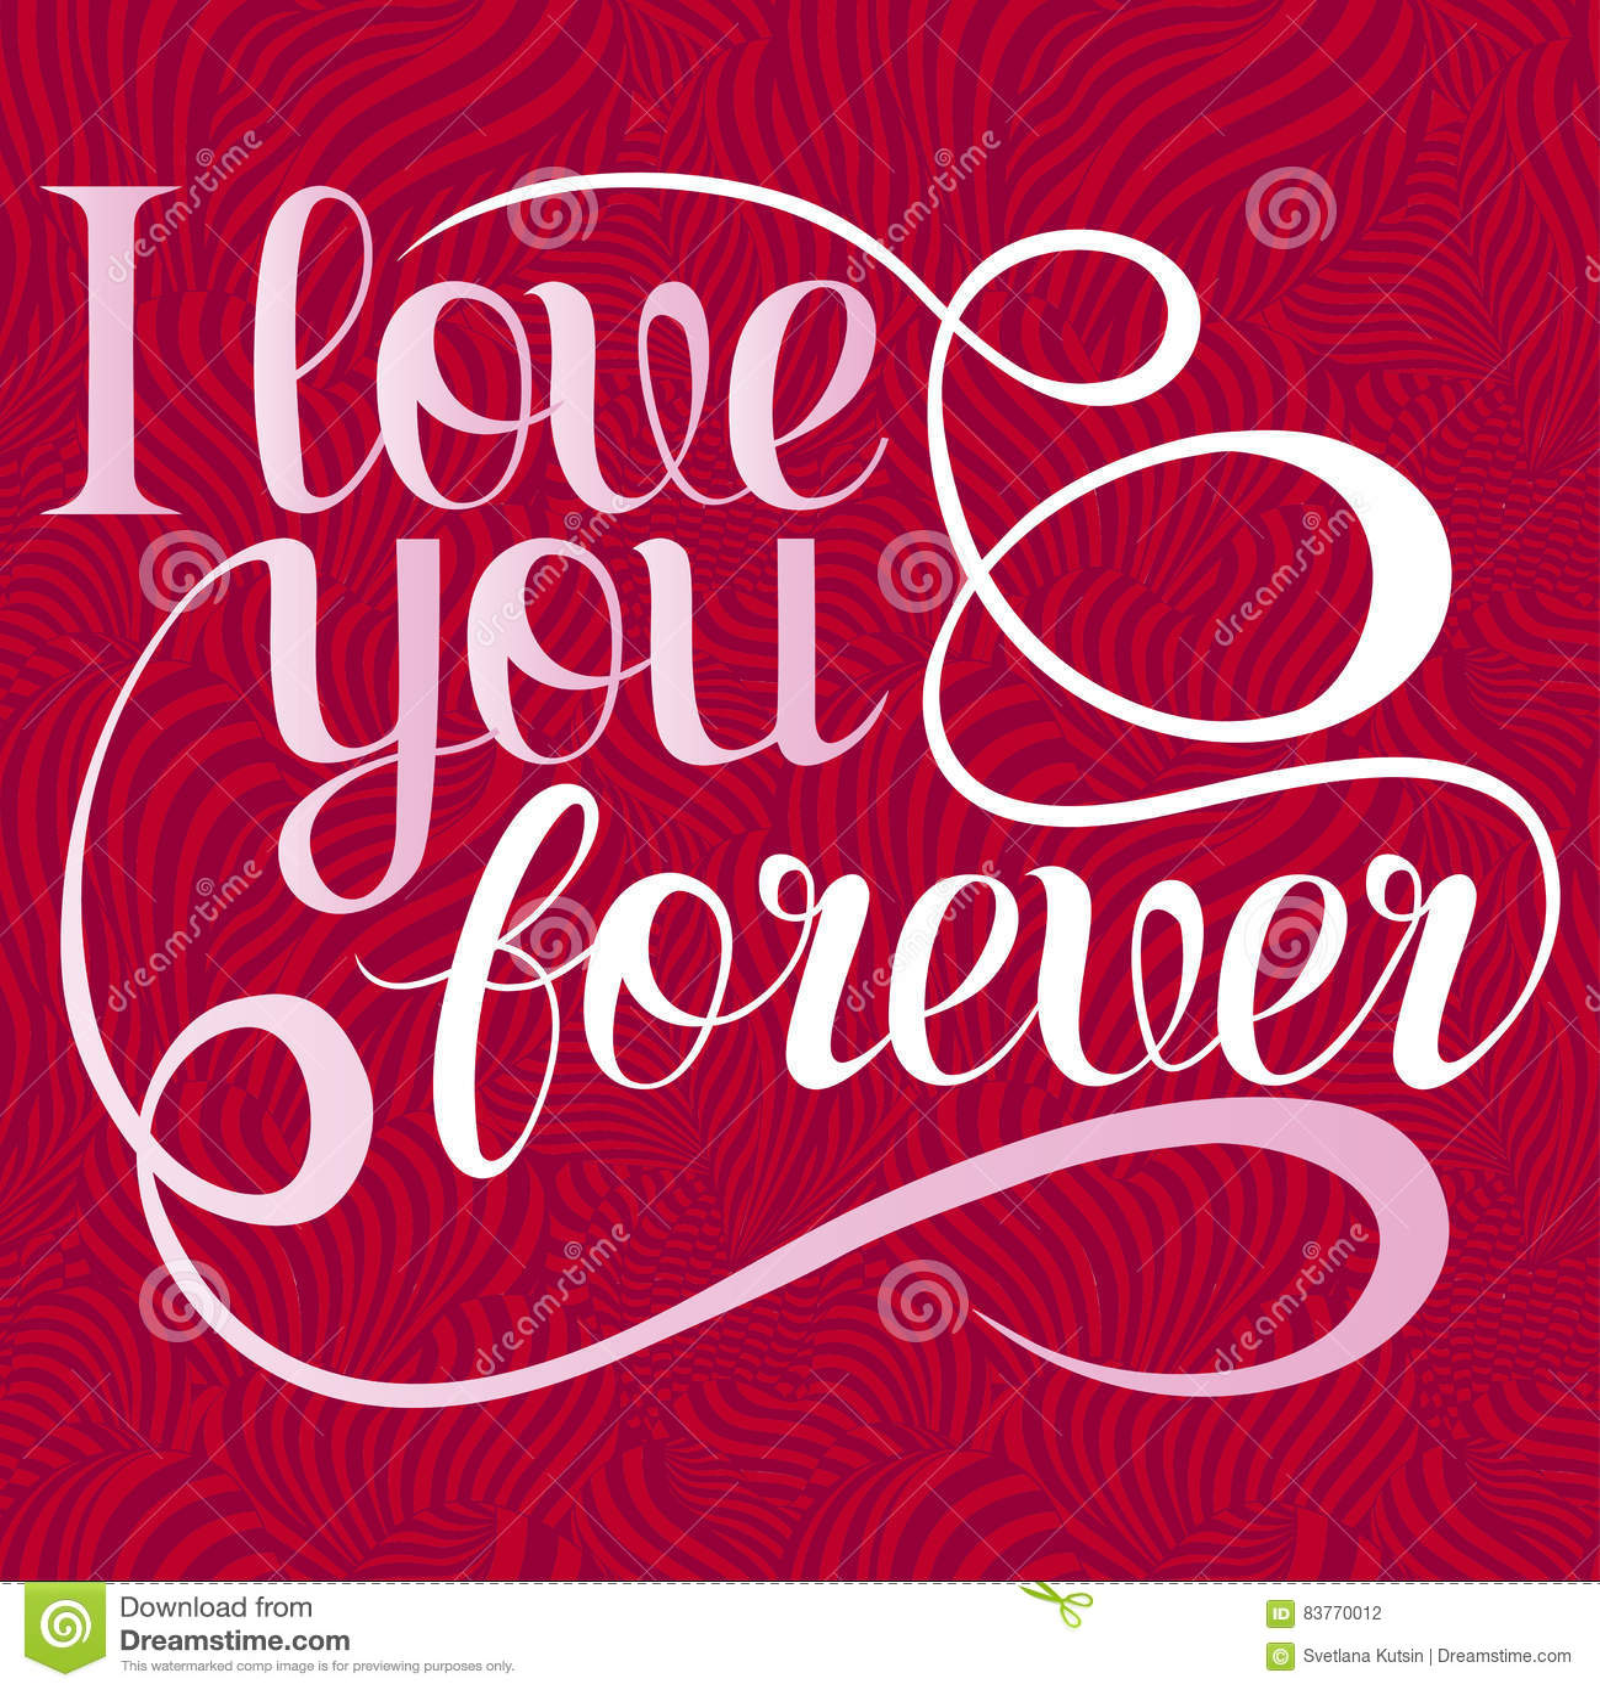 Valentines Day Lettering I Love You Forever Design Elements For